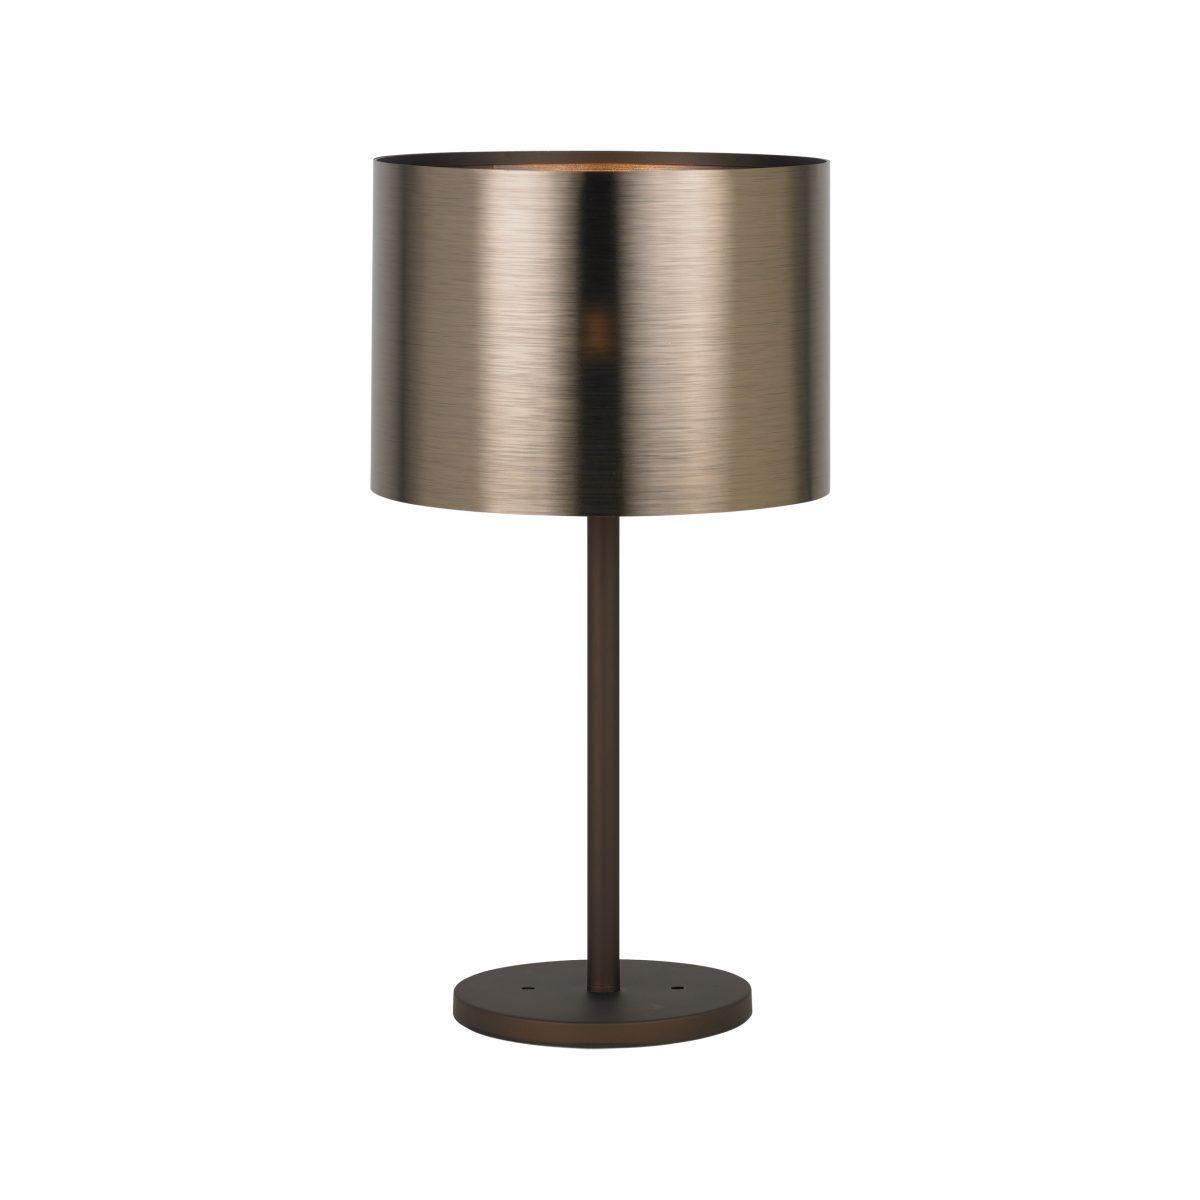 Настольная лампа SAGANTO 1 EGLO 39394 - Фото №28